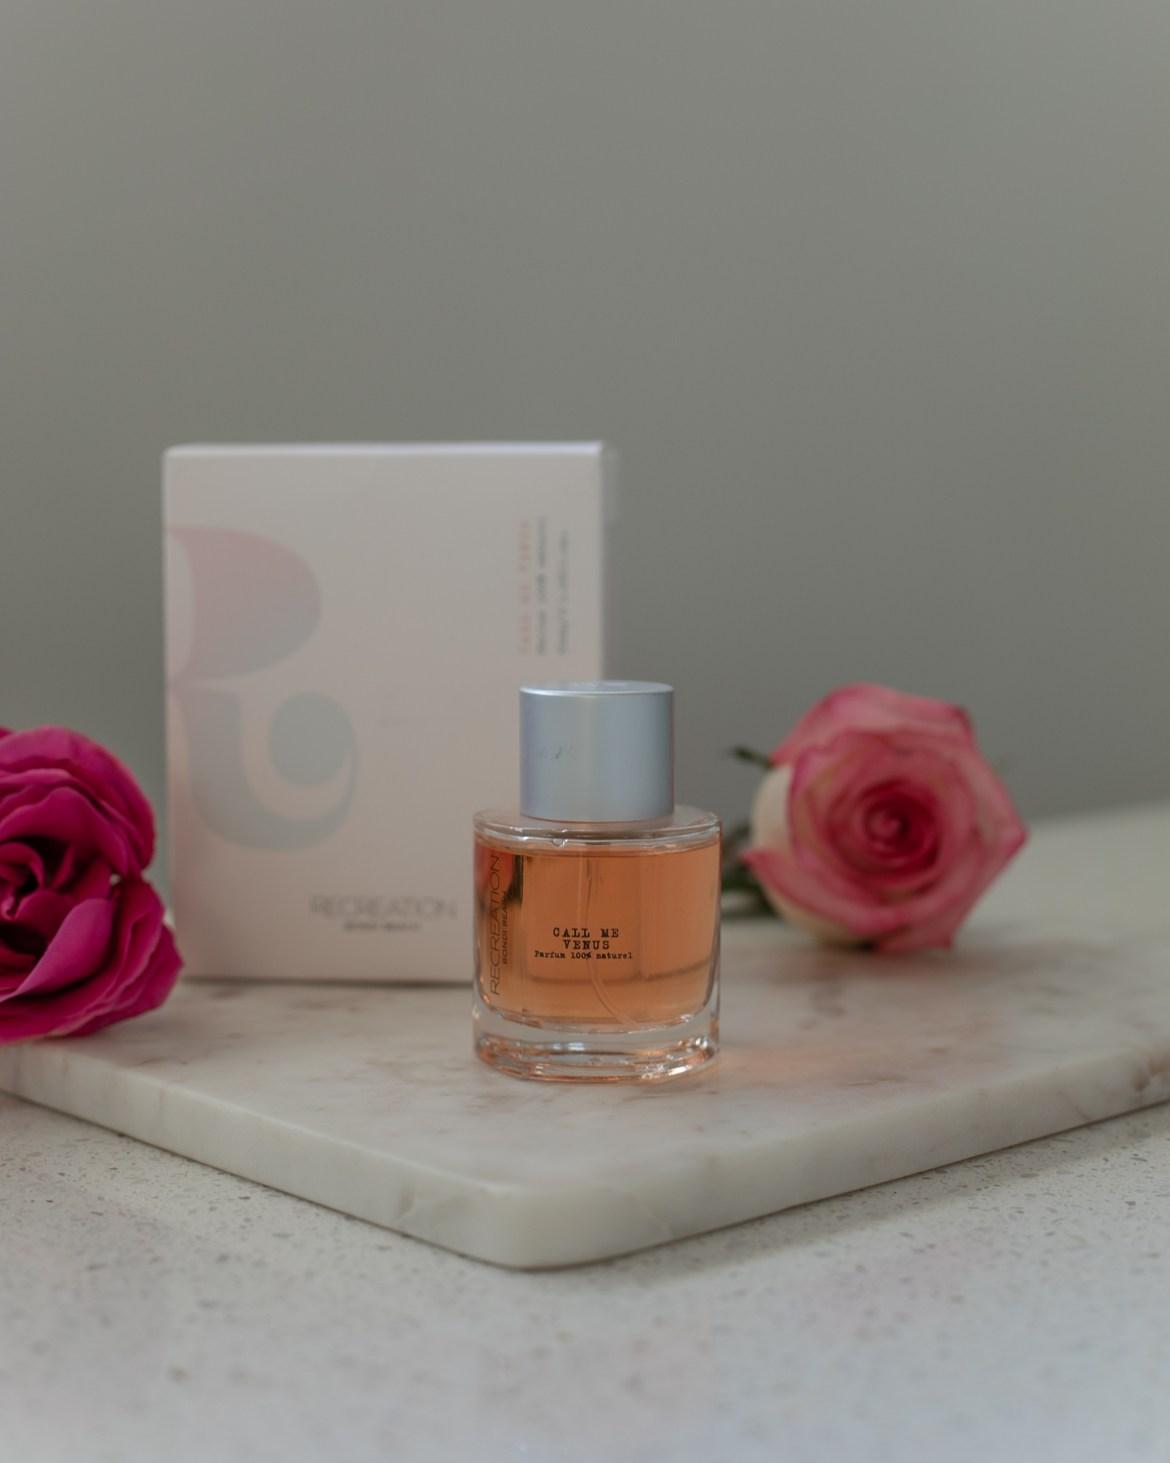 Call Me Venus fragrance for Valentine's Day